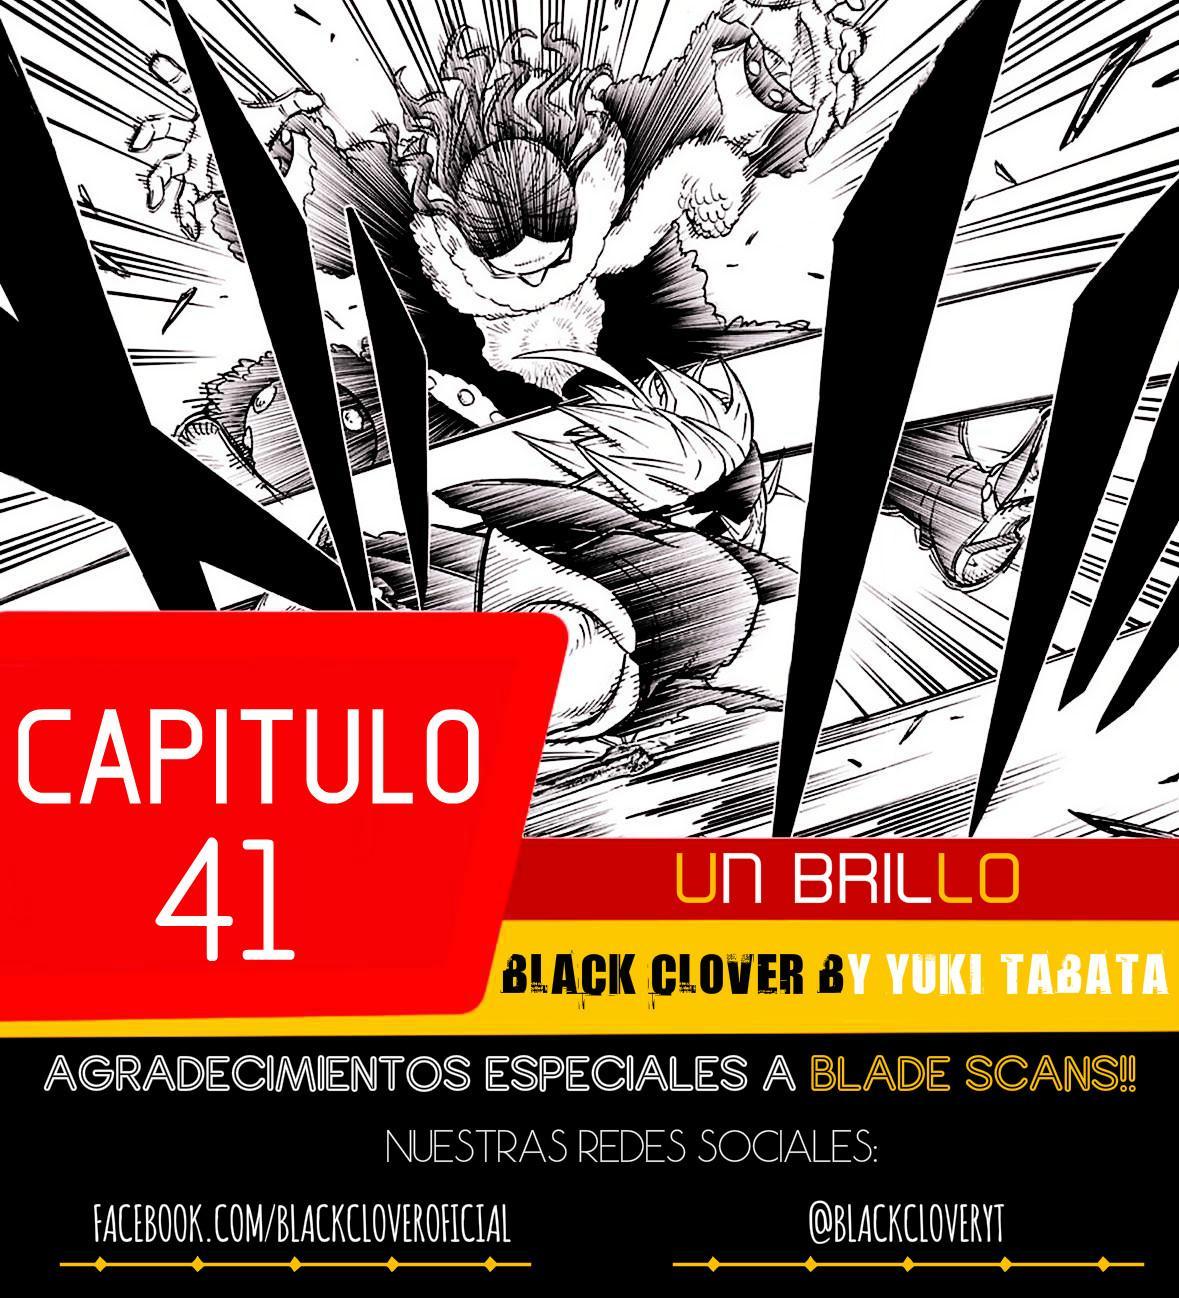 http://c5.ninemanga.com/es_manga/35/3811/432581/0d173a5f998a6ce4a461508bd6e72668.jpg Page 1